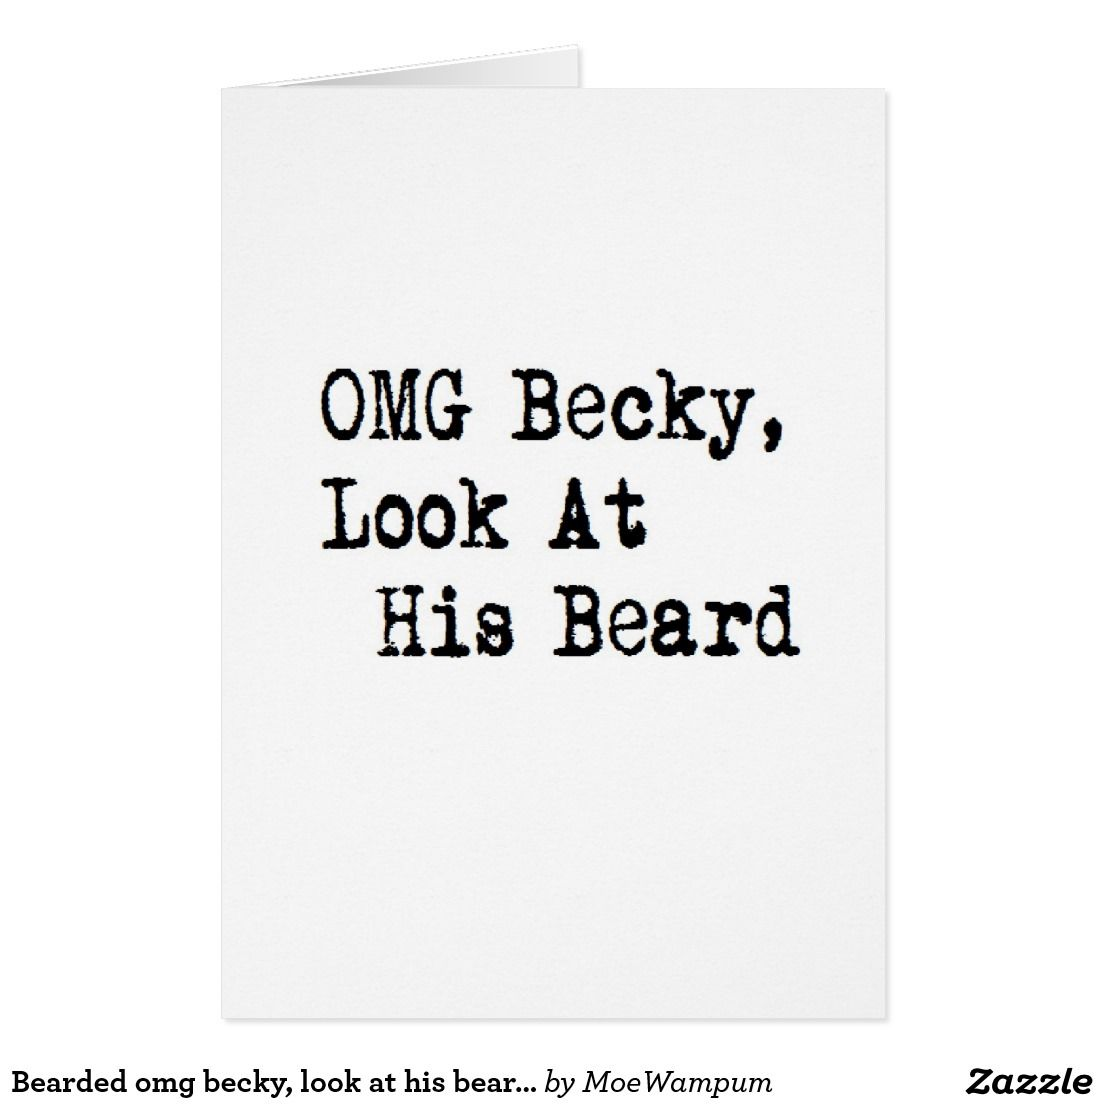 Bearded Omg Becky Look At His Beard Funny Xmas Holiday Card